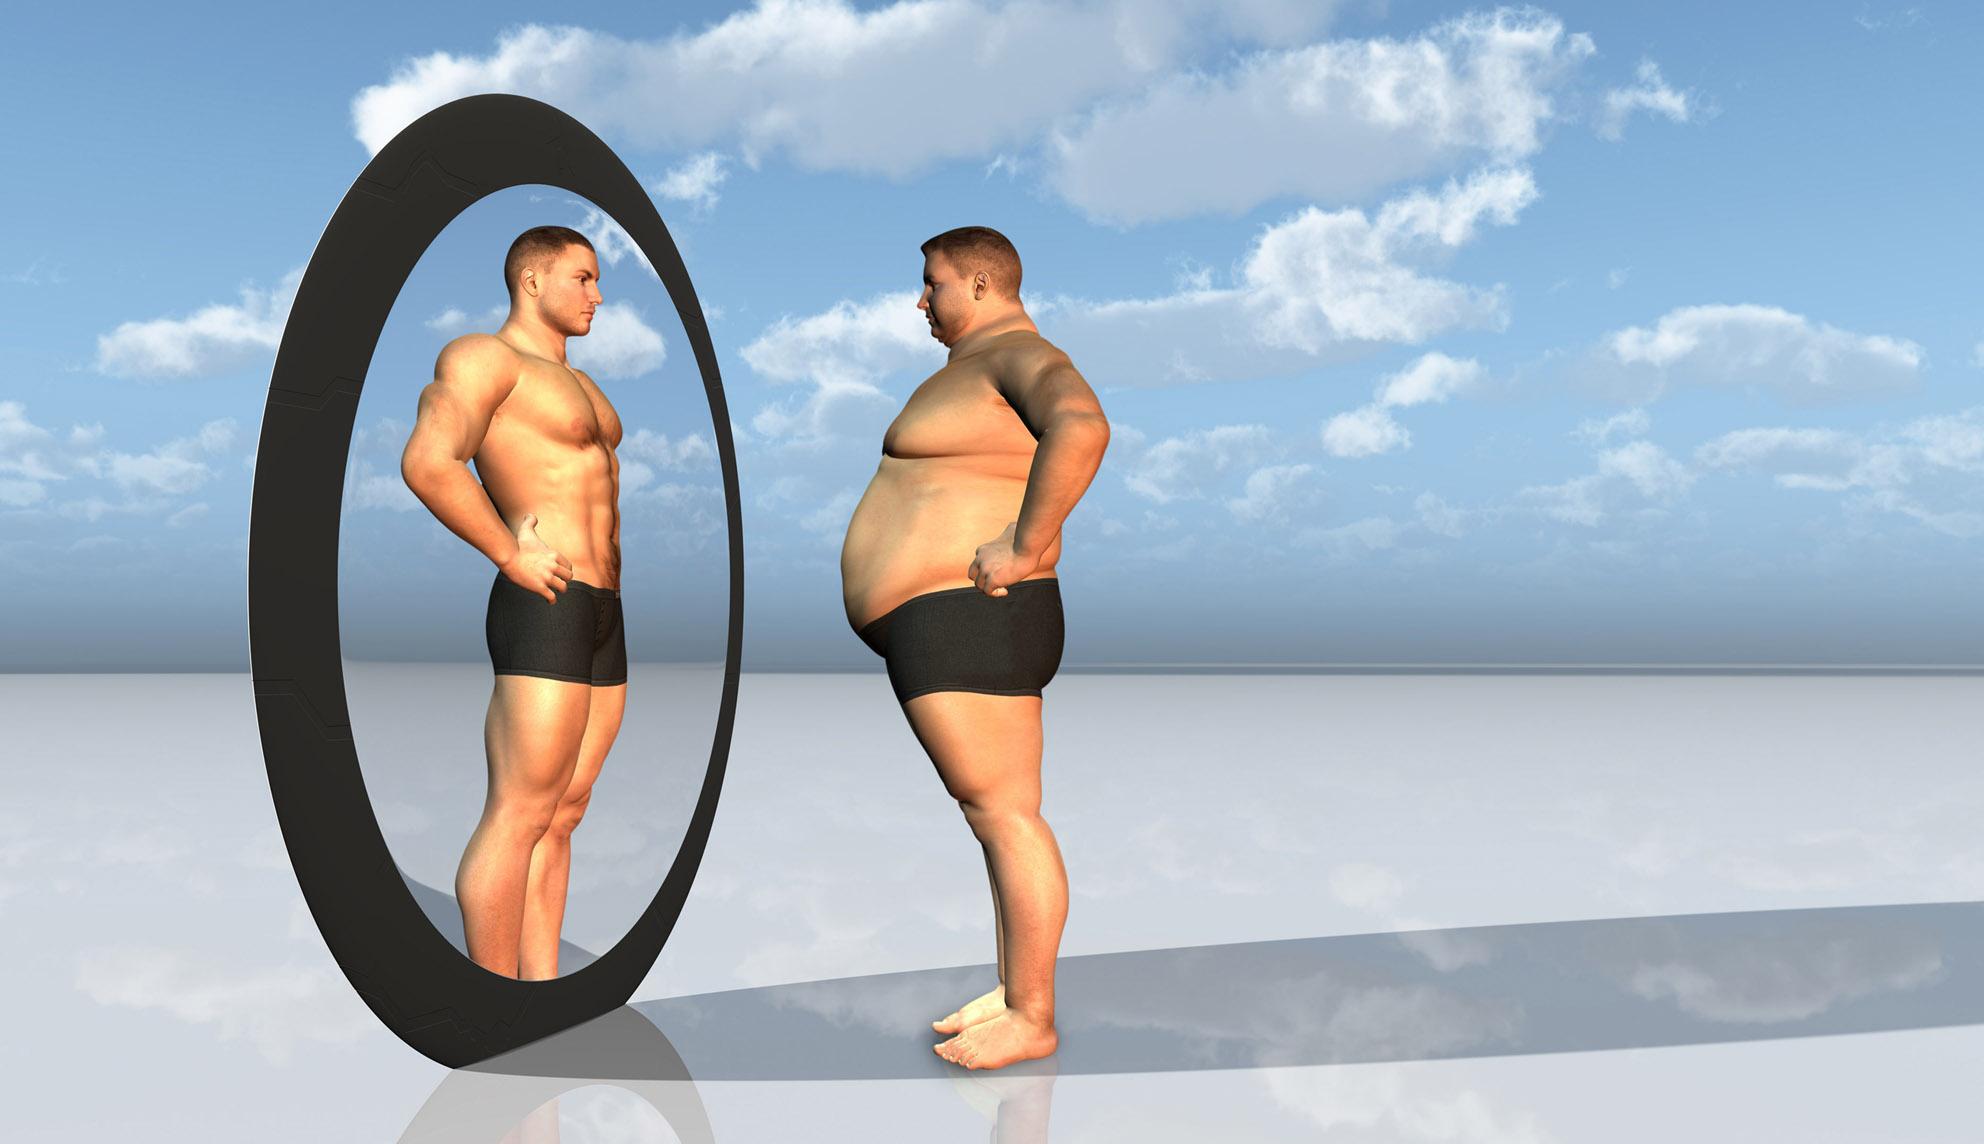 Low-Self-Esteem mirror